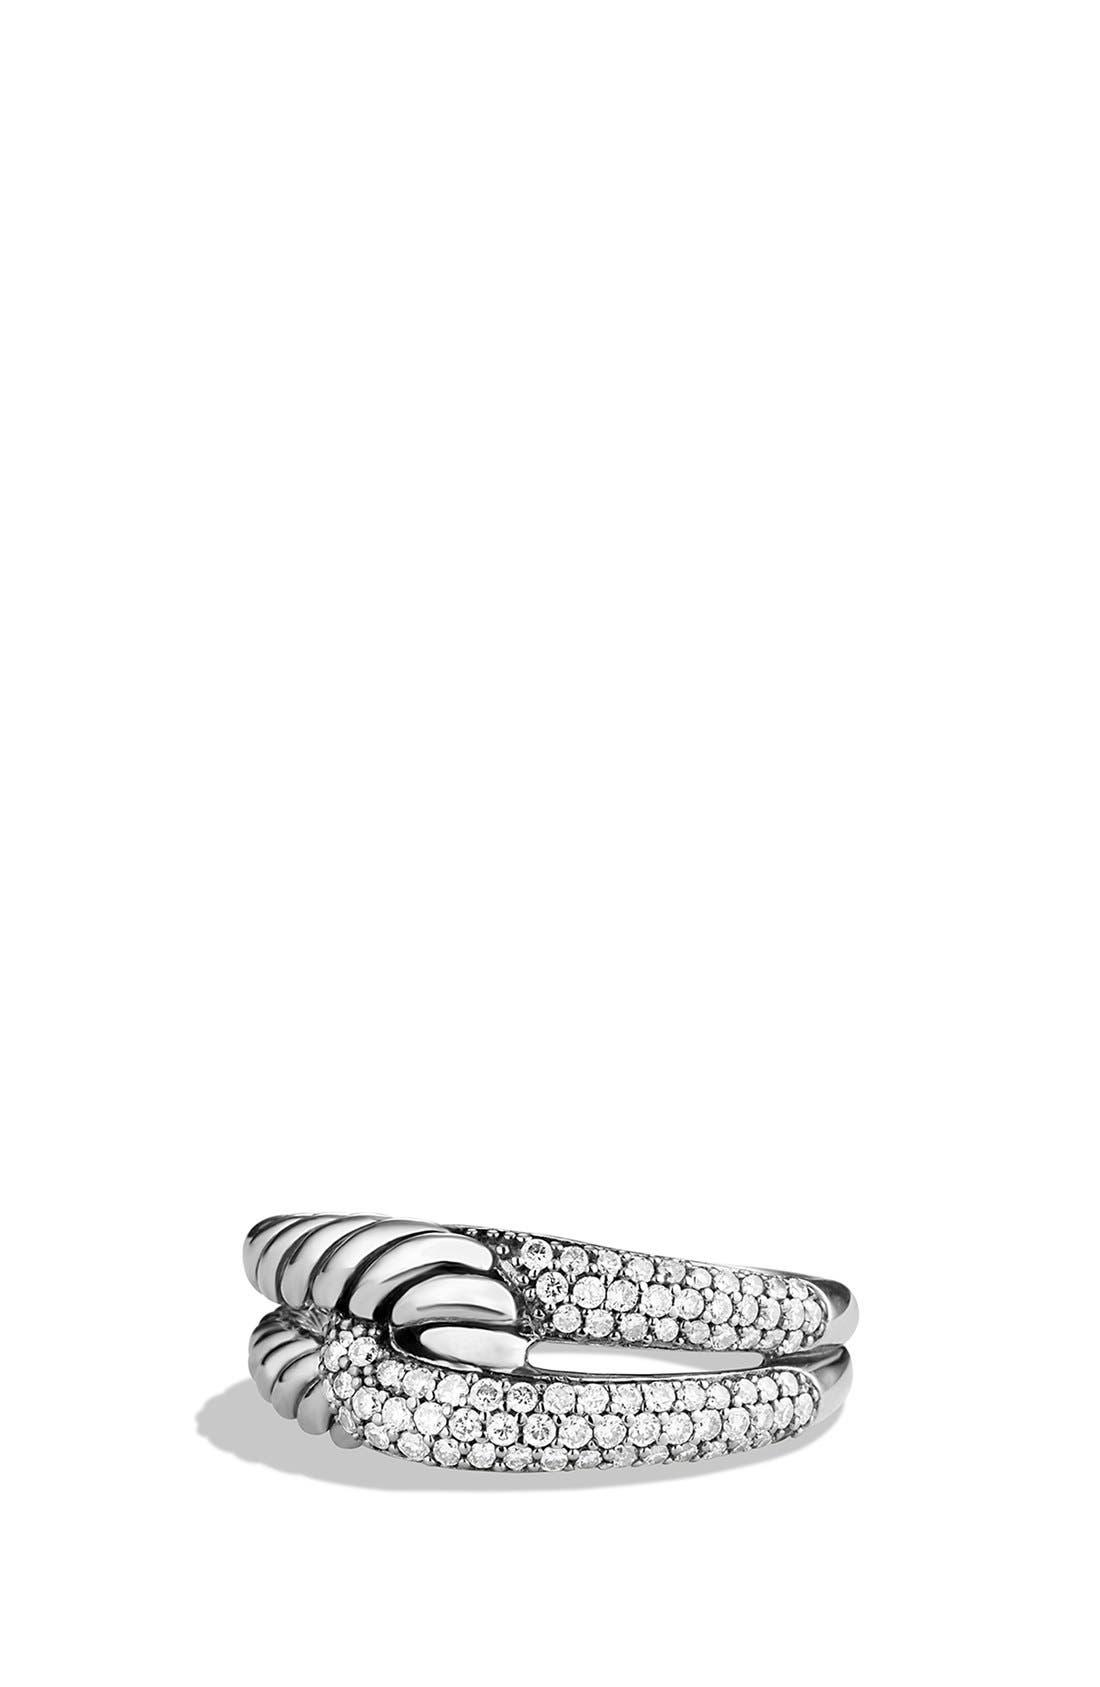 David Yurman 'Labyrinth' Single Loop Ring with Diamonds